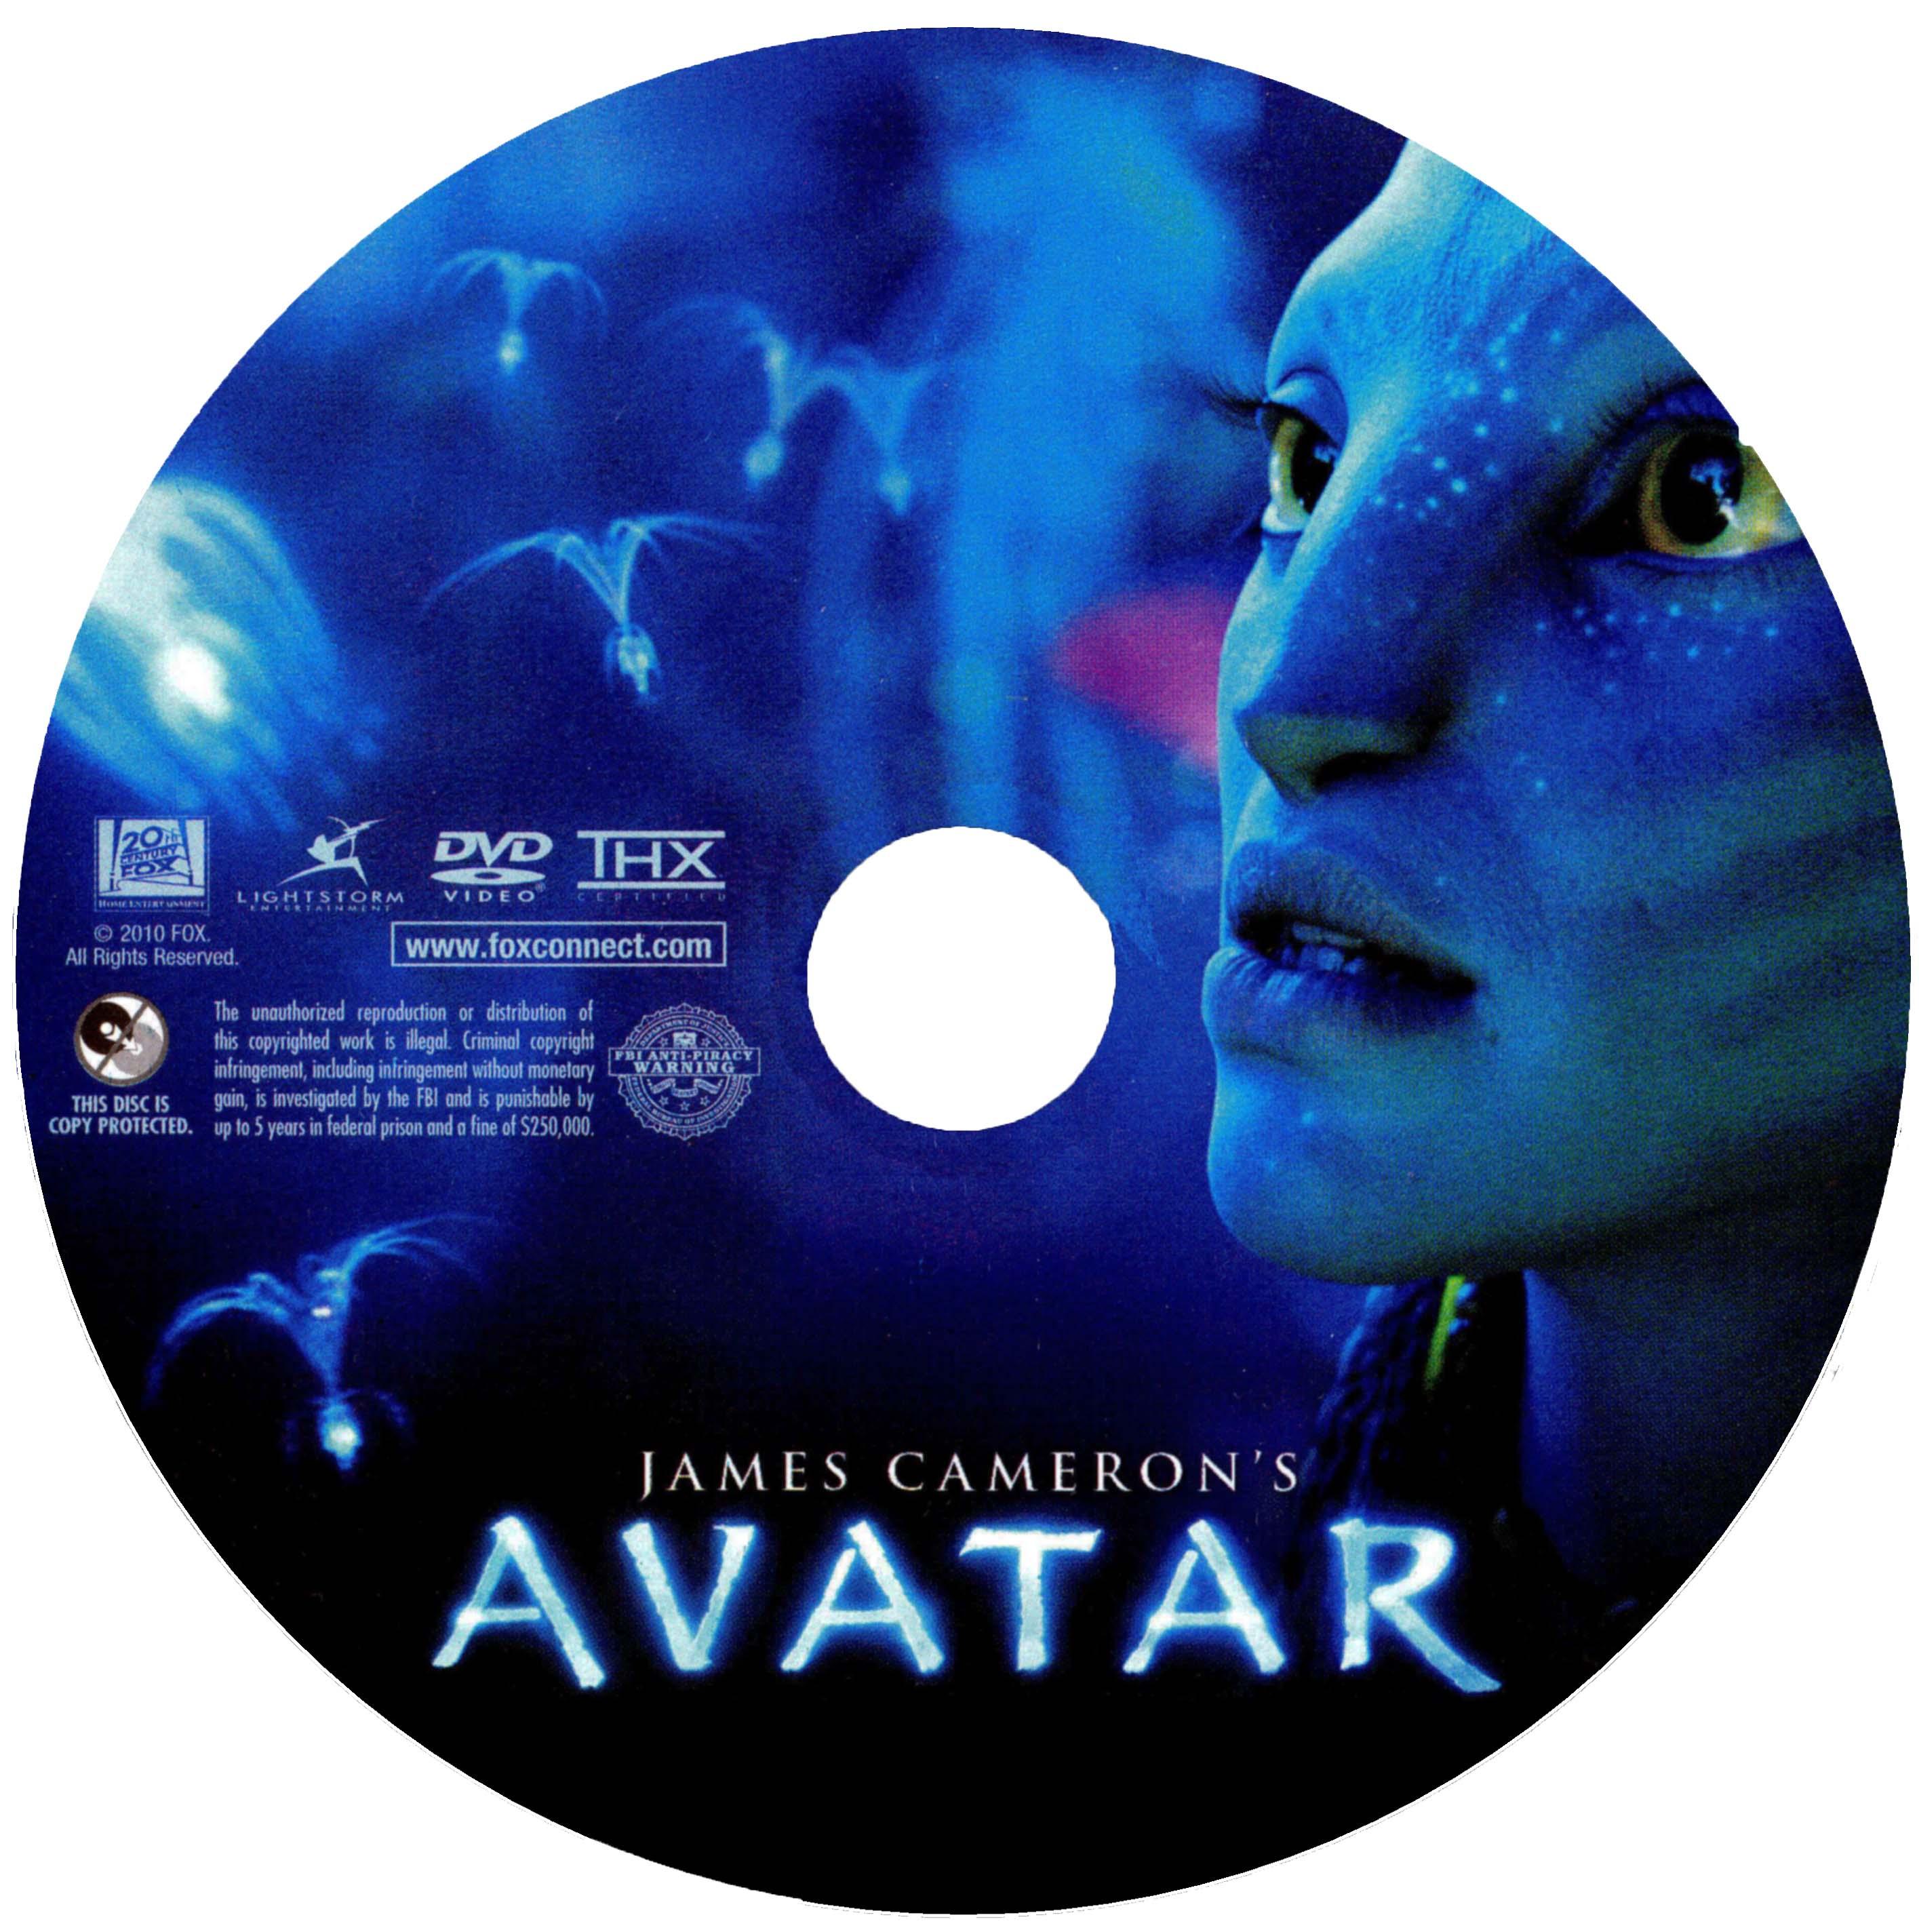 Avatar 2 On Dvd: COVERS.BOX.SK ::: Avatar (2009) Disk